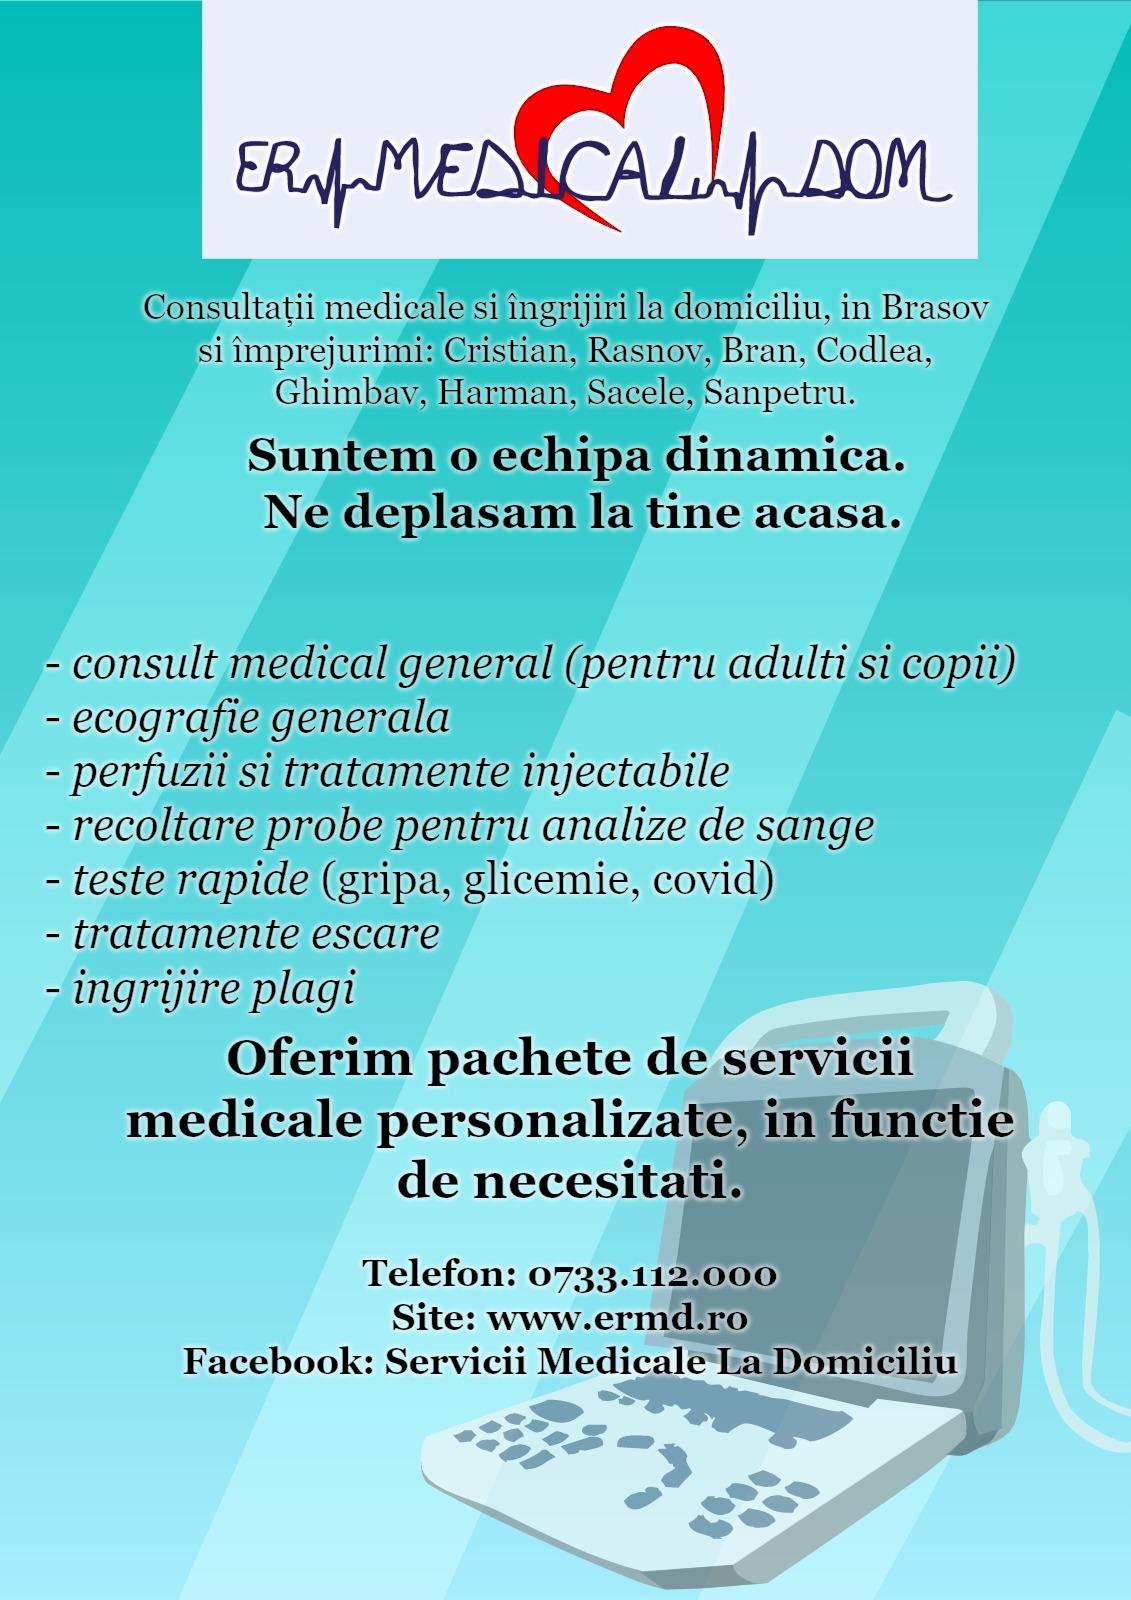 ER MEDICAL DOM - servicii medicale la domiciliu